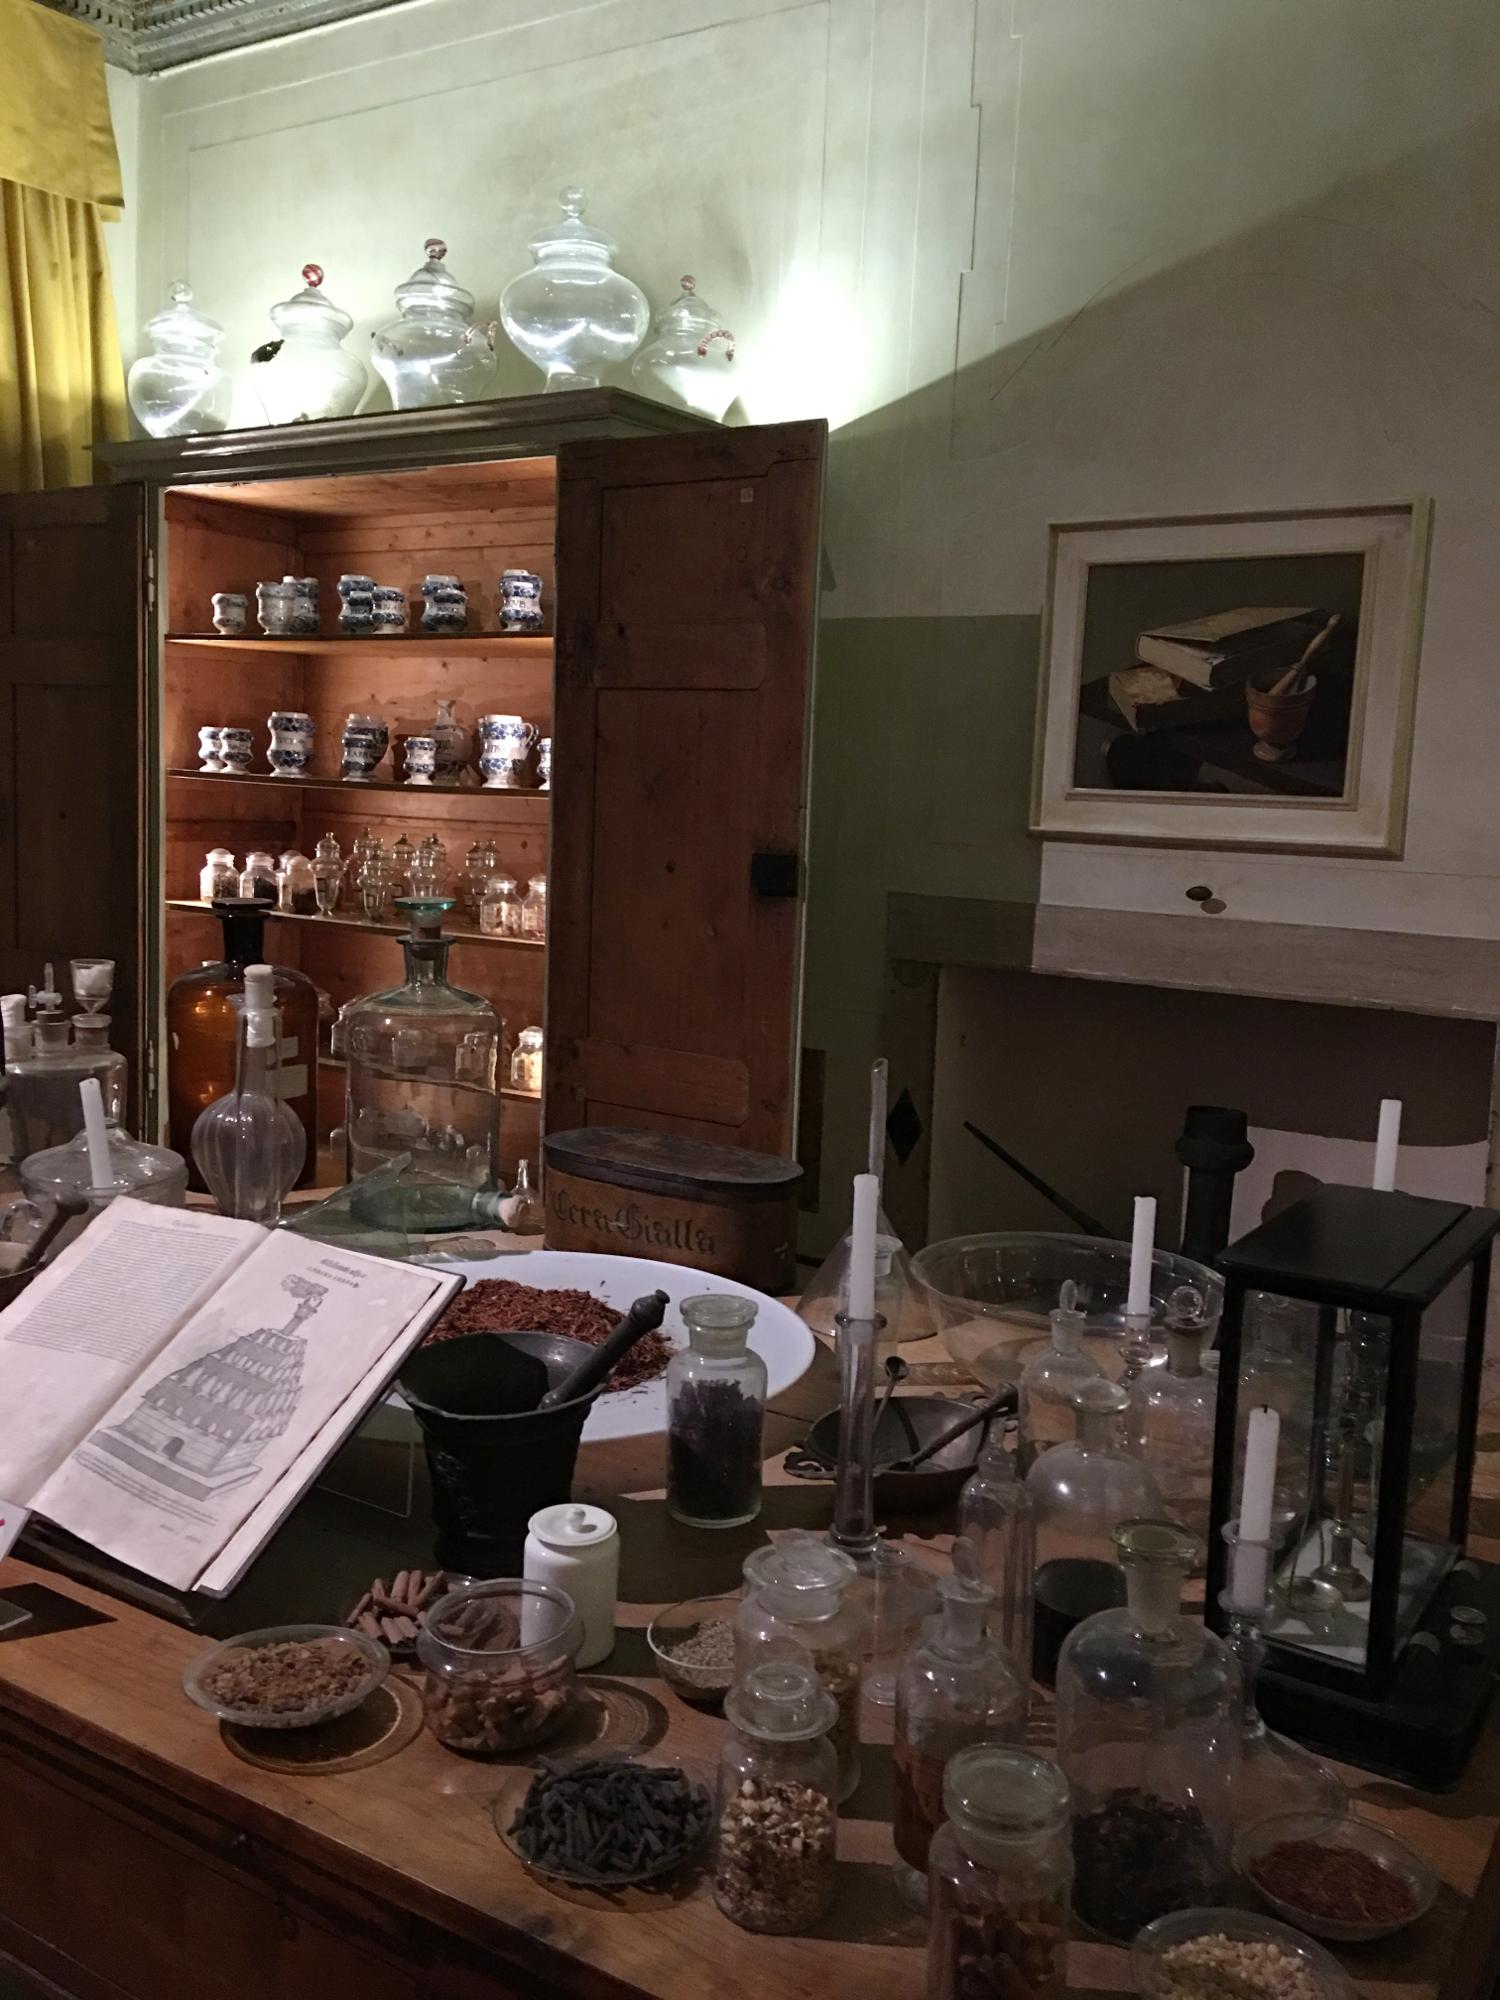 rocaille-blog-venezia-palazzo-mocenigo-percorso-profumo-mavive-vidal-50